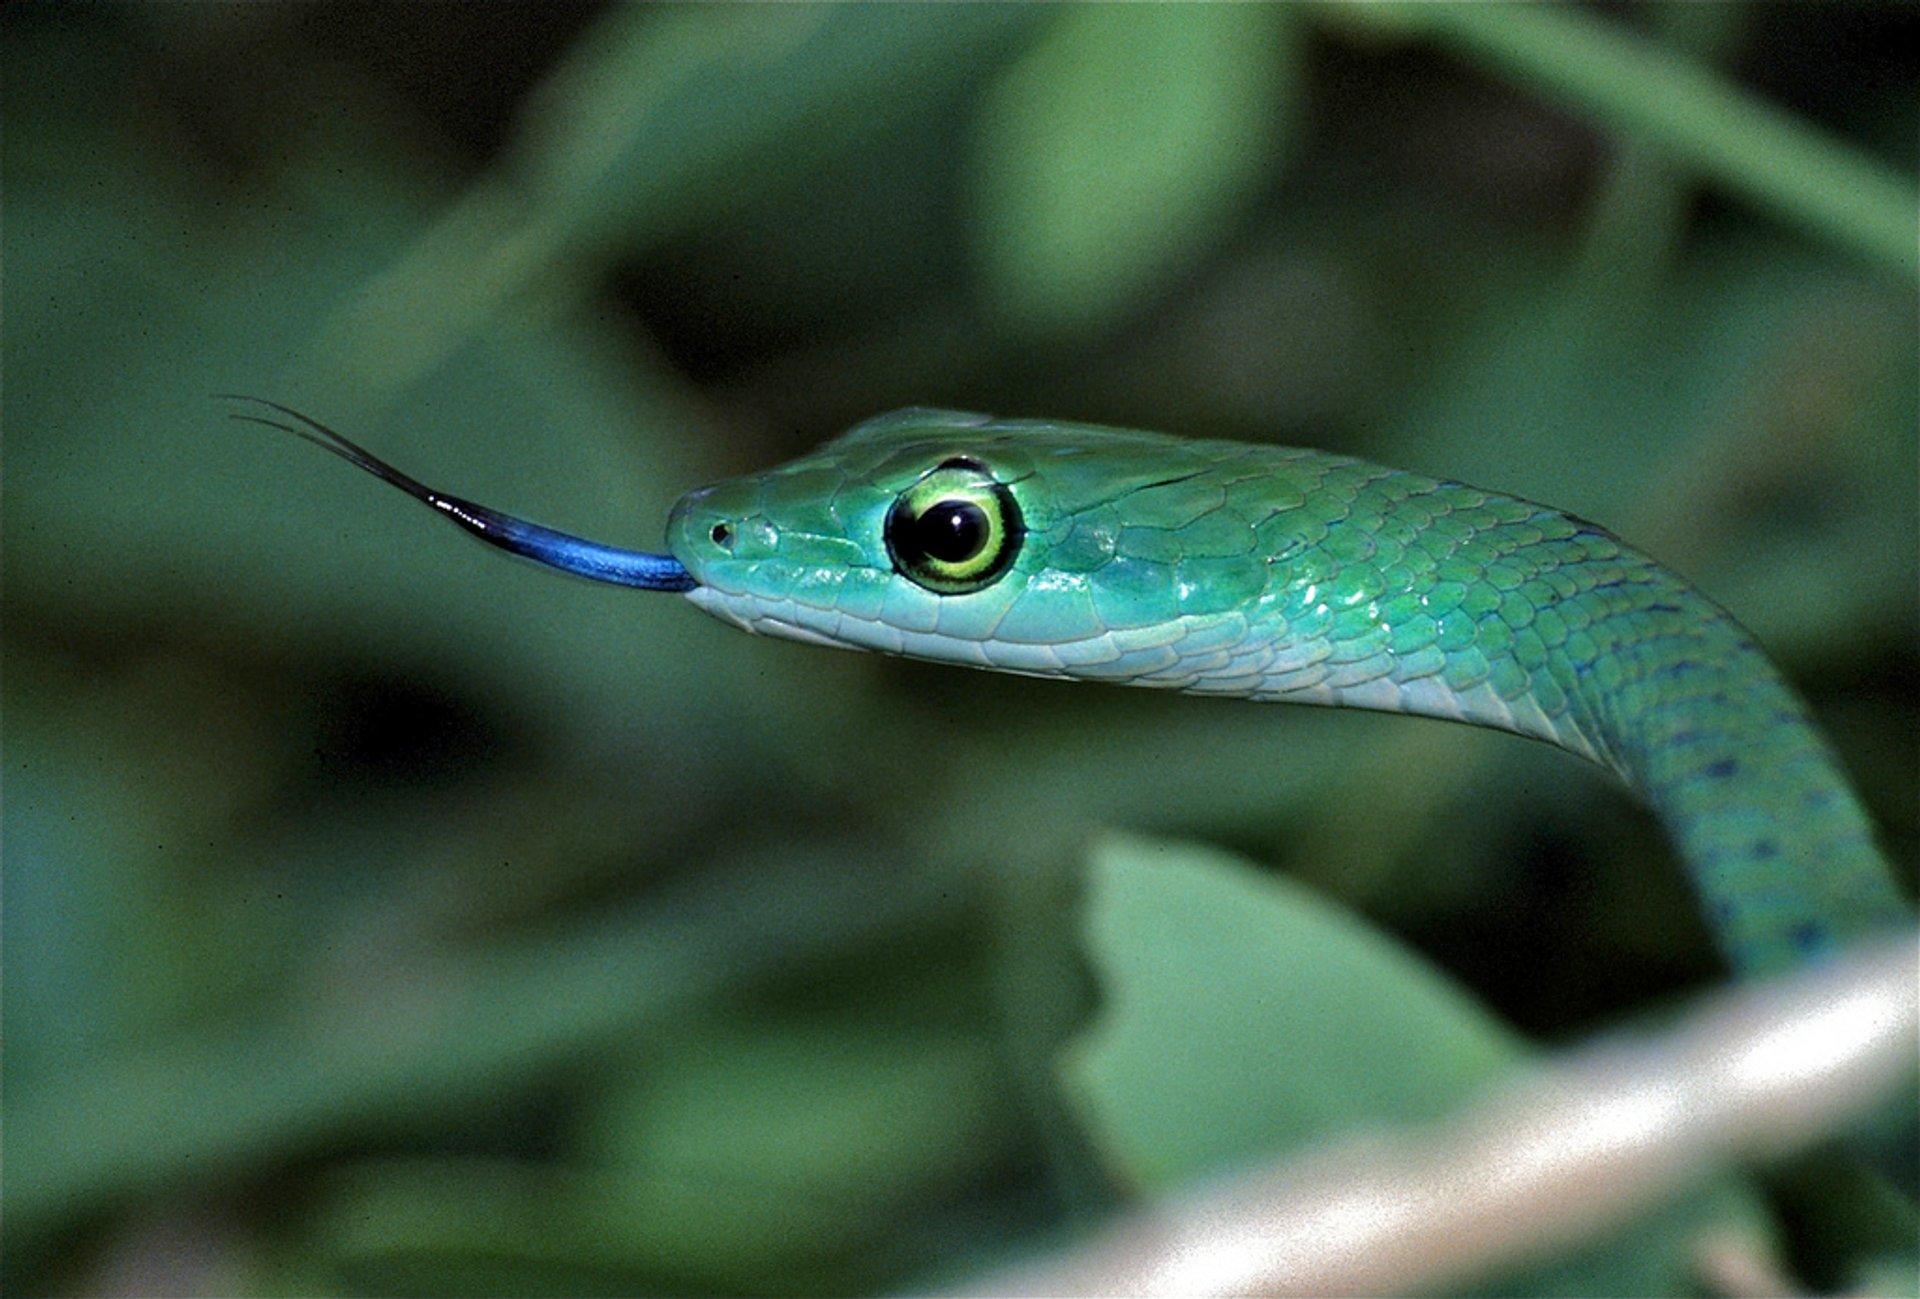 Snake Safari in Kenya 2020 - Best Time